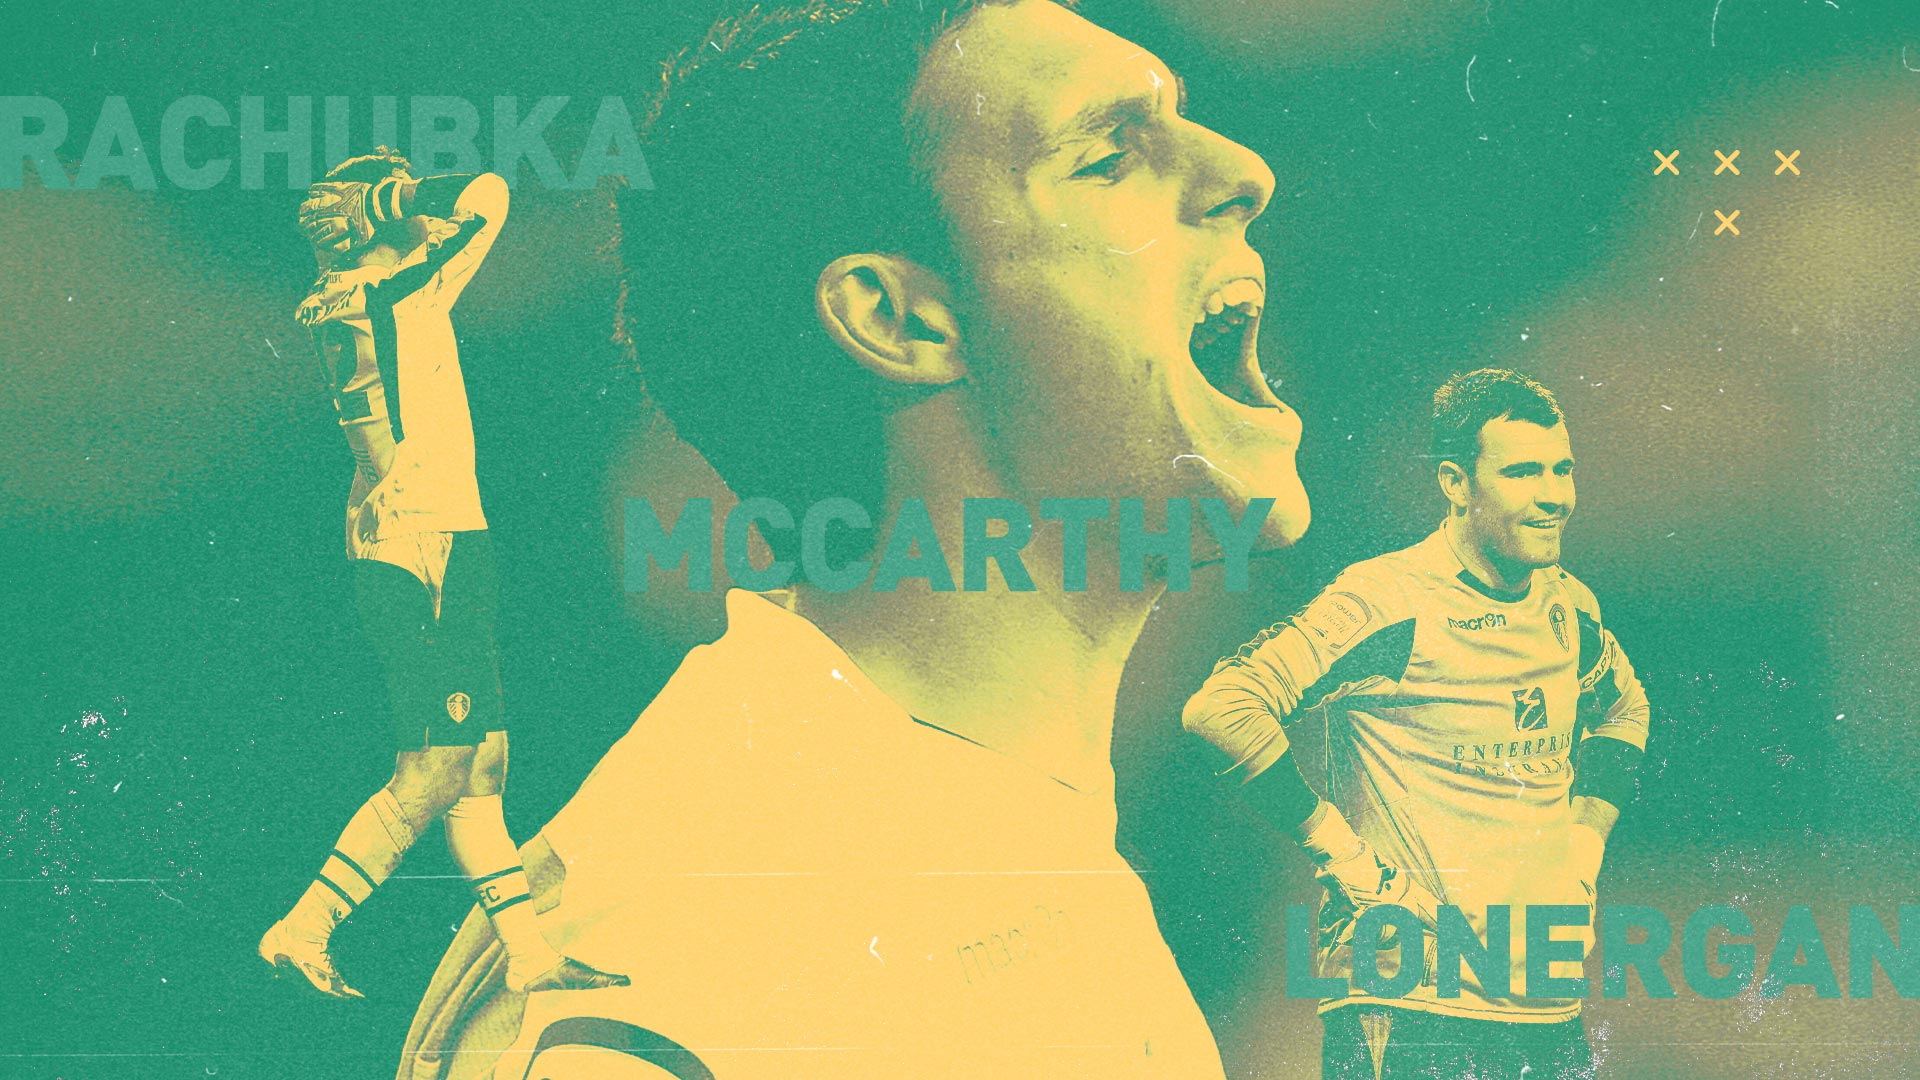 Rachubka, McCarthy, Lonergan, United in nightmares